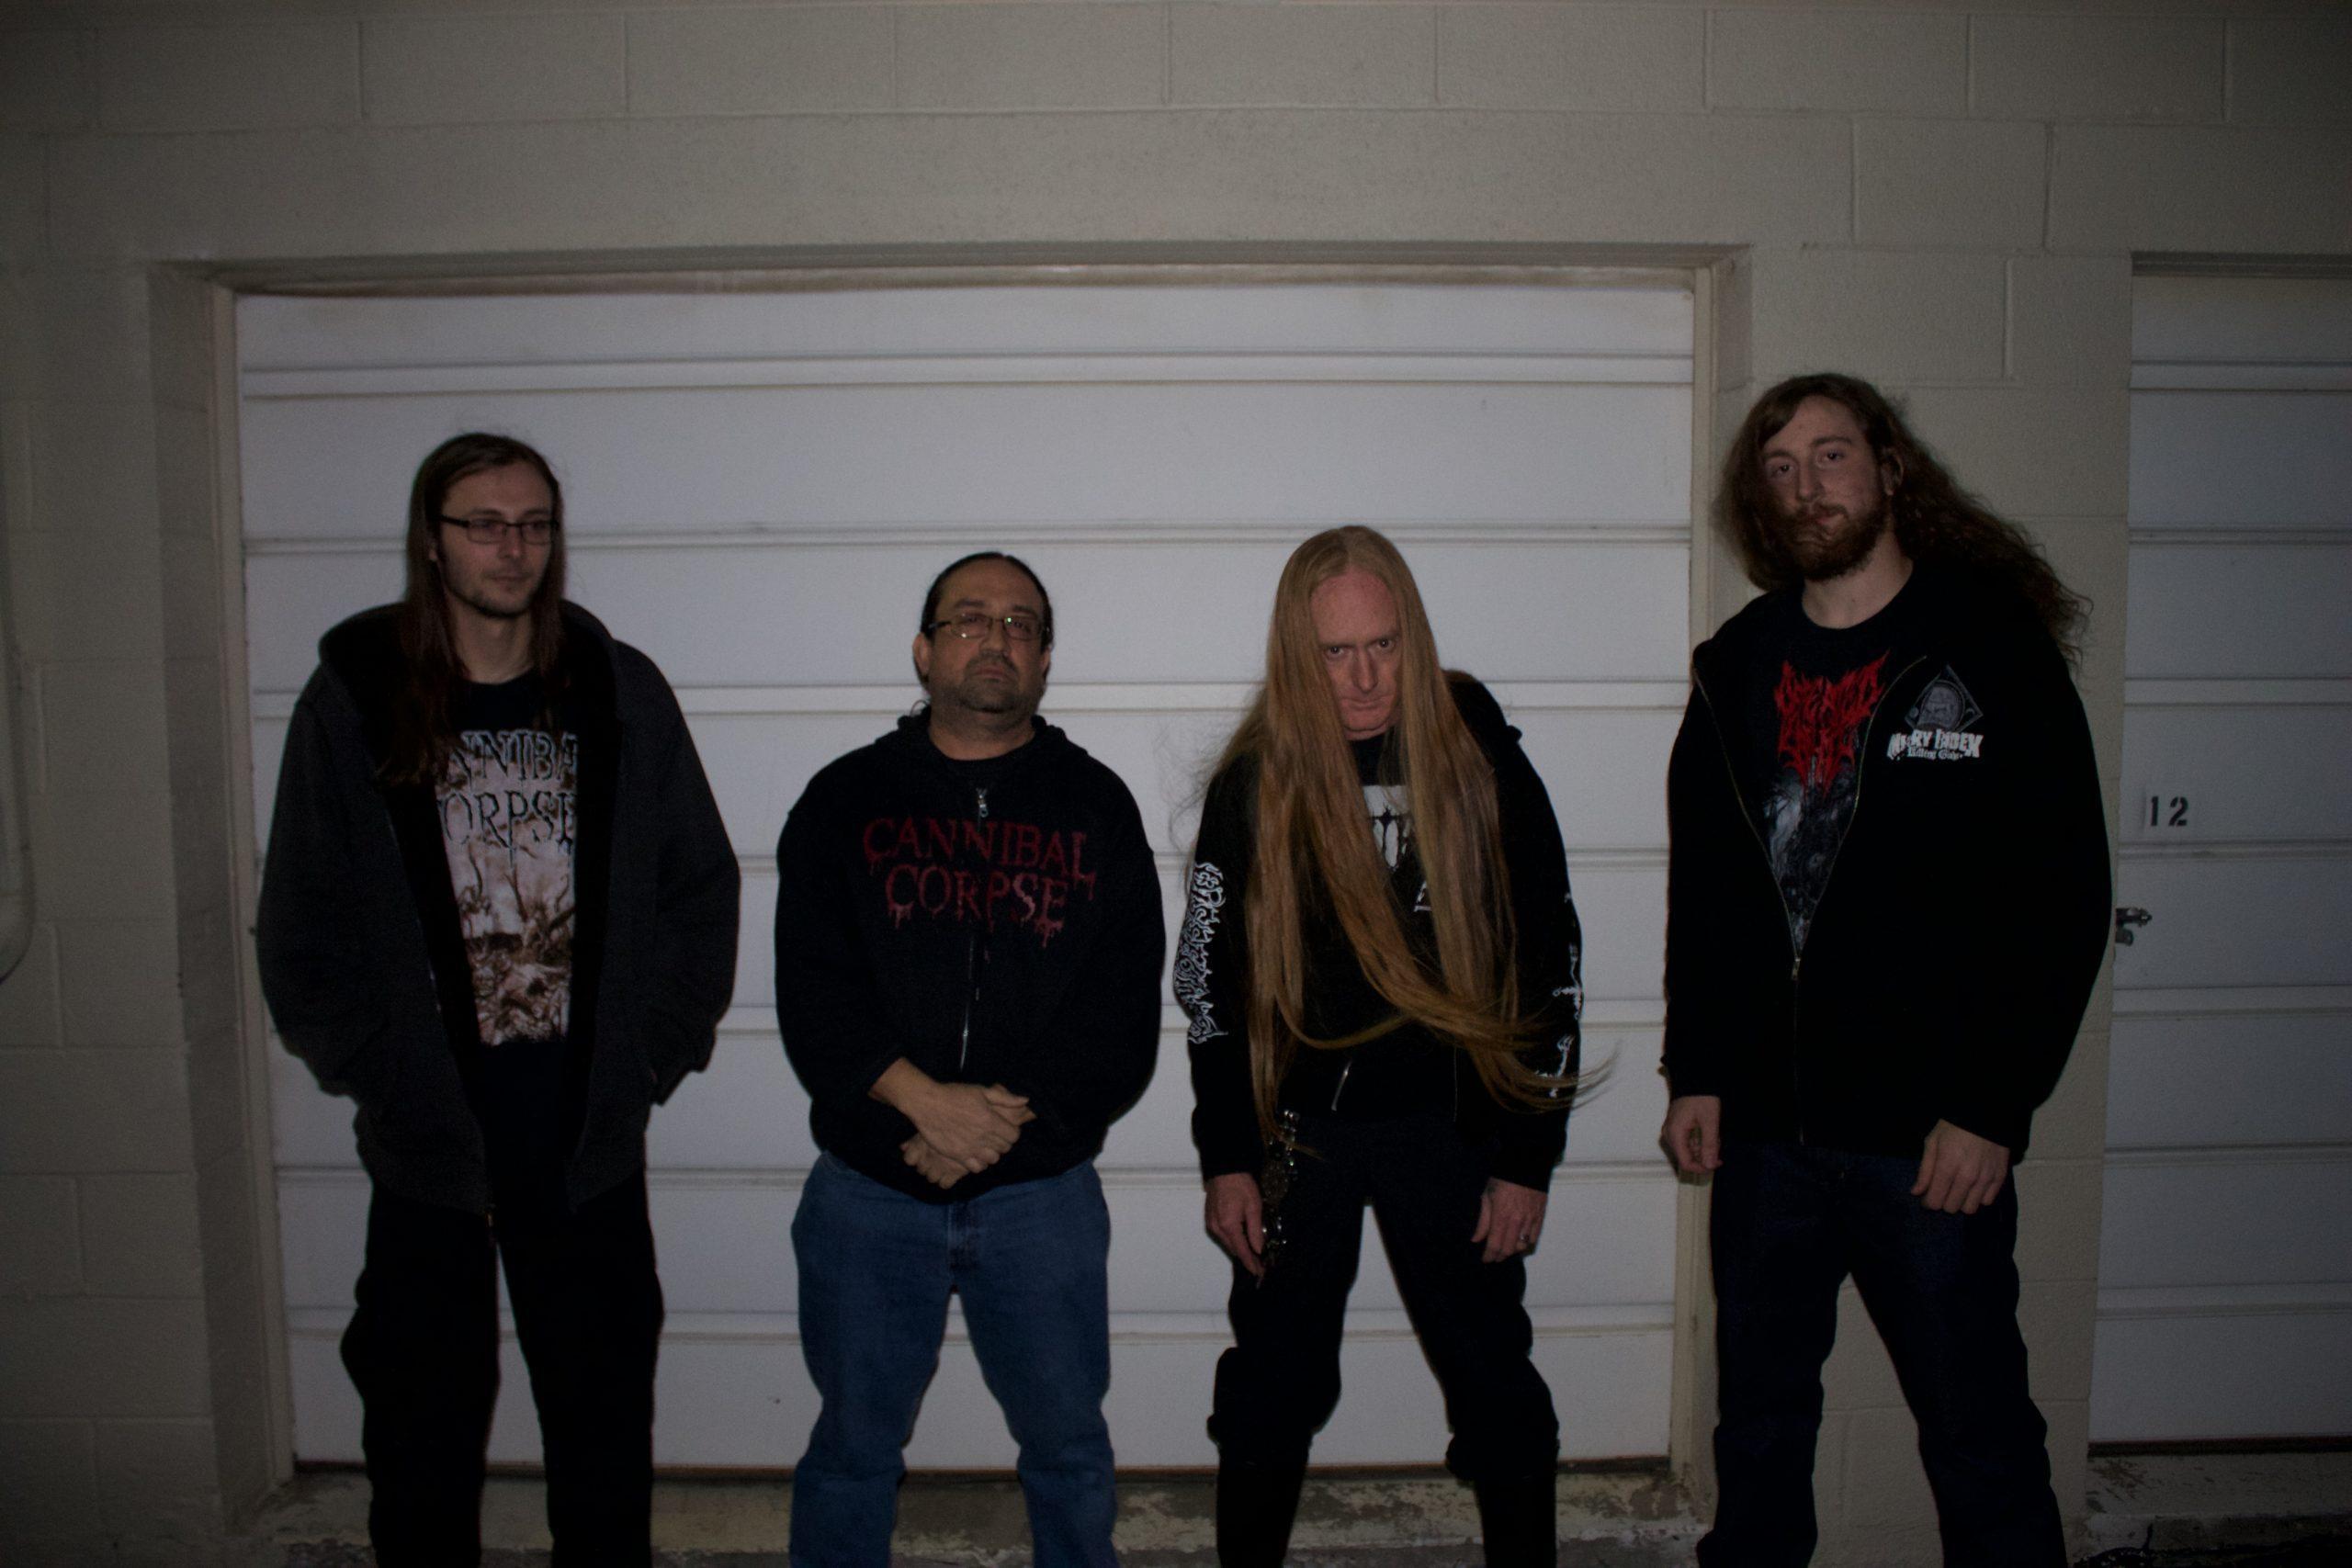 PHOTO: Loveland's Tierkrieger blends death and black metal. Photo credit: James Wyatt